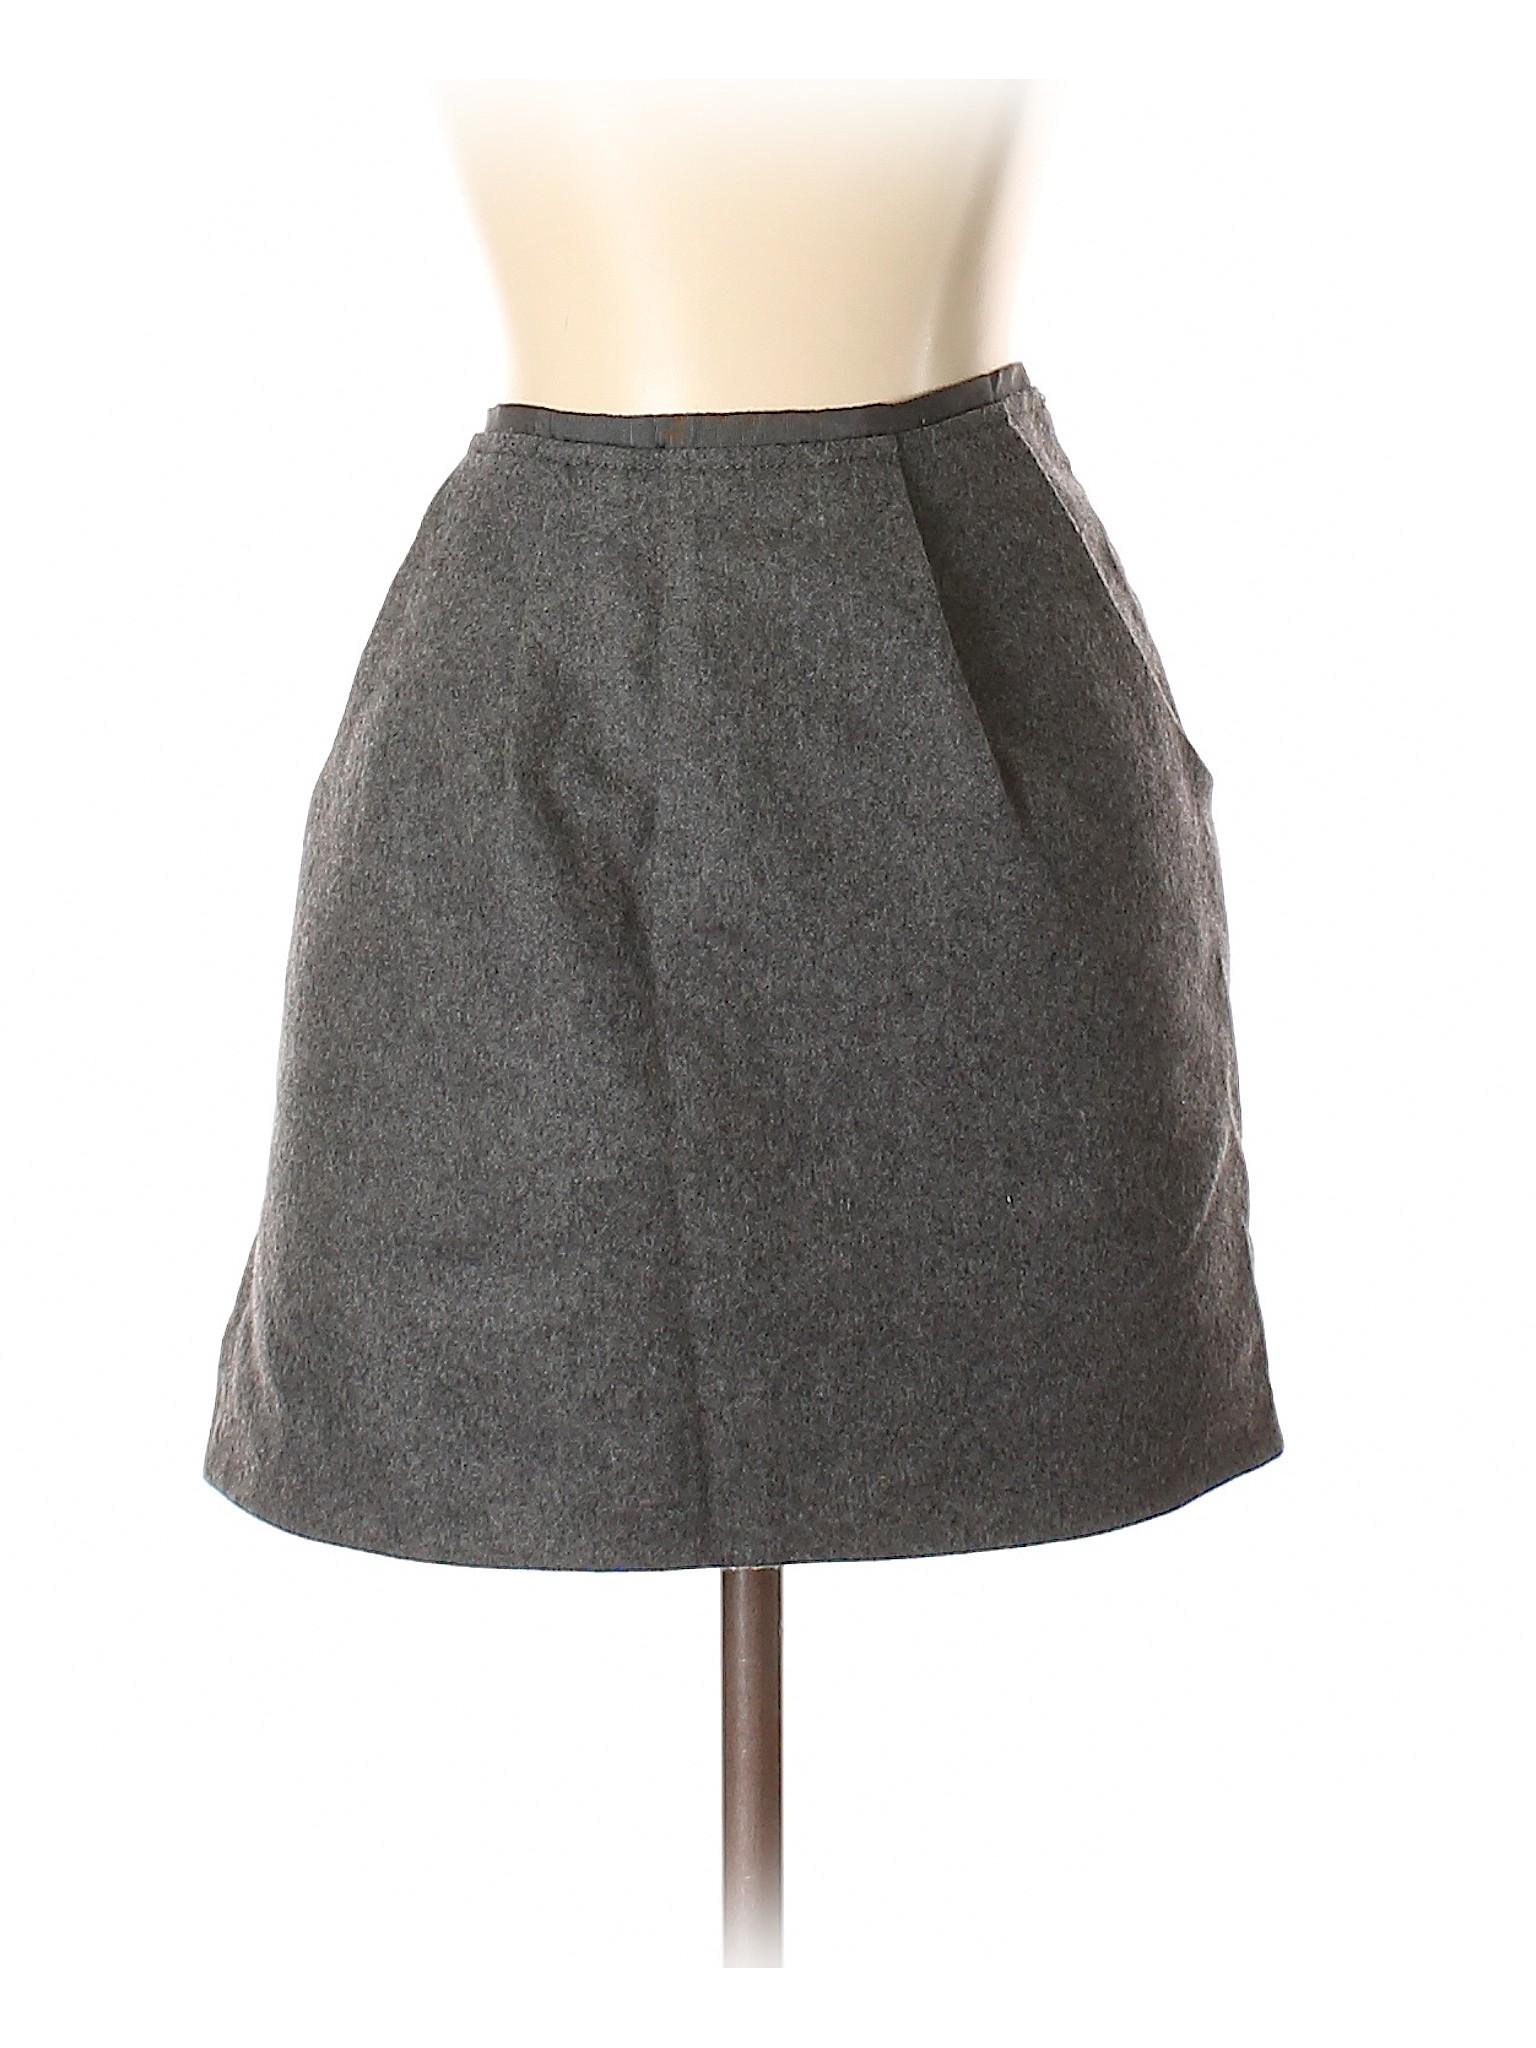 Wool Wool Skirt Skirt Skirt Boutique Boutique Boutique Boutique Wool Wool Boutique Skirt Skirt Boutique Wool Wool PB1nxv